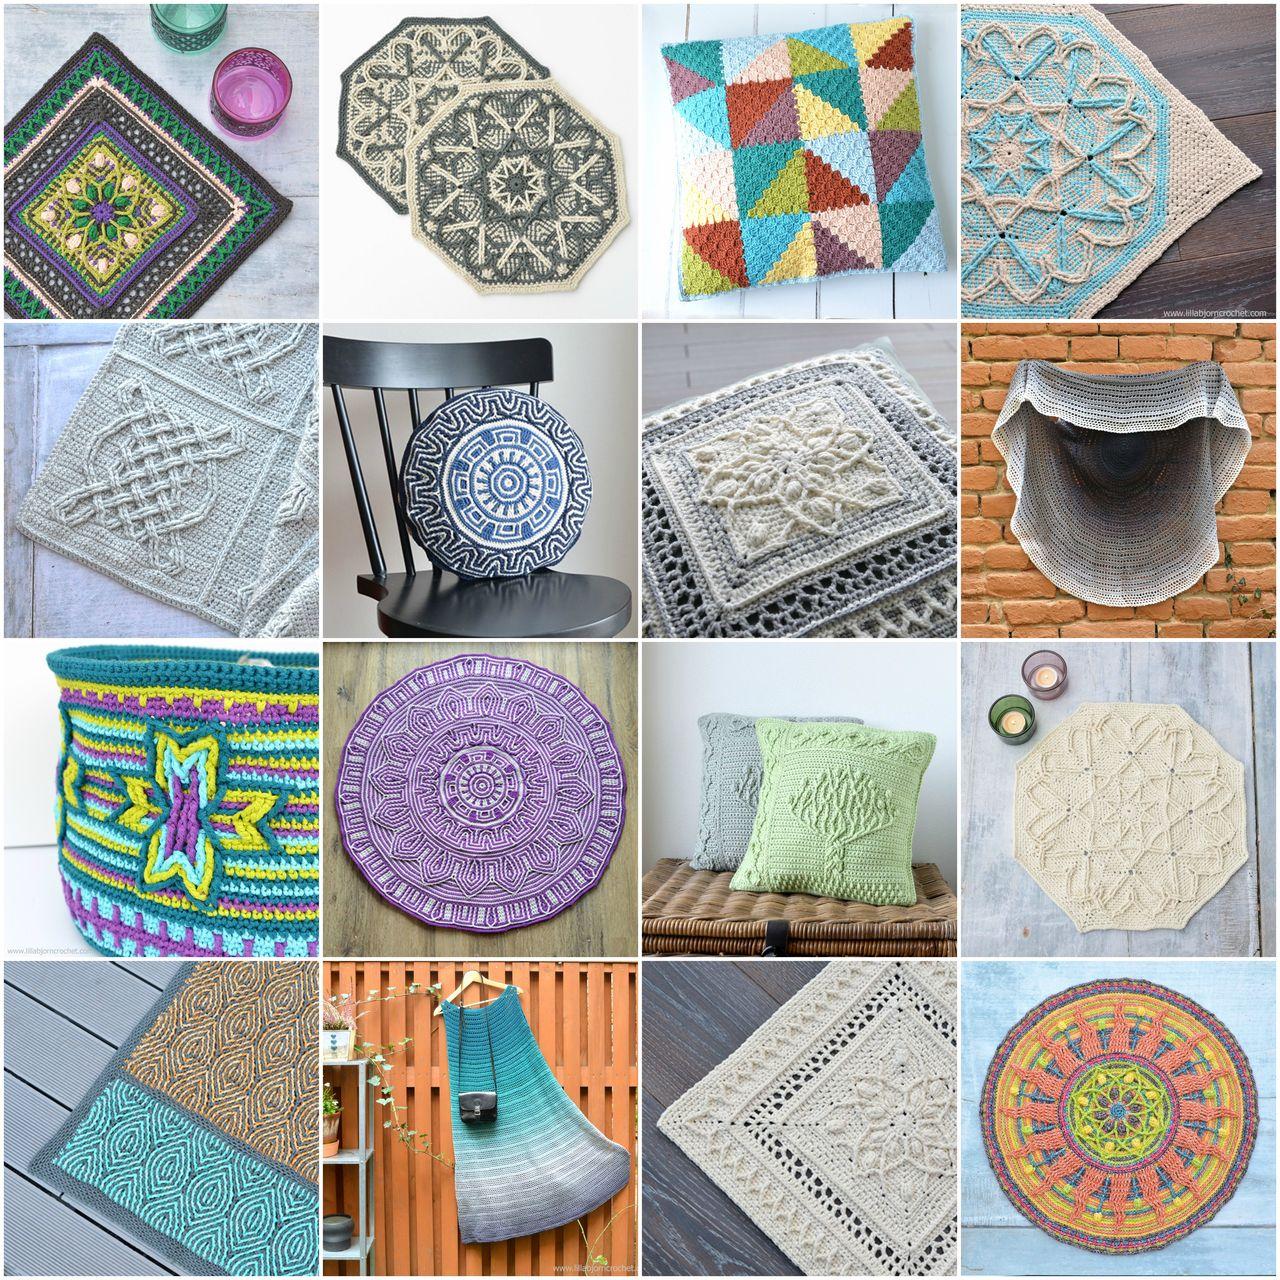 Overlay crochet design by www.lillabjorncrochet.com